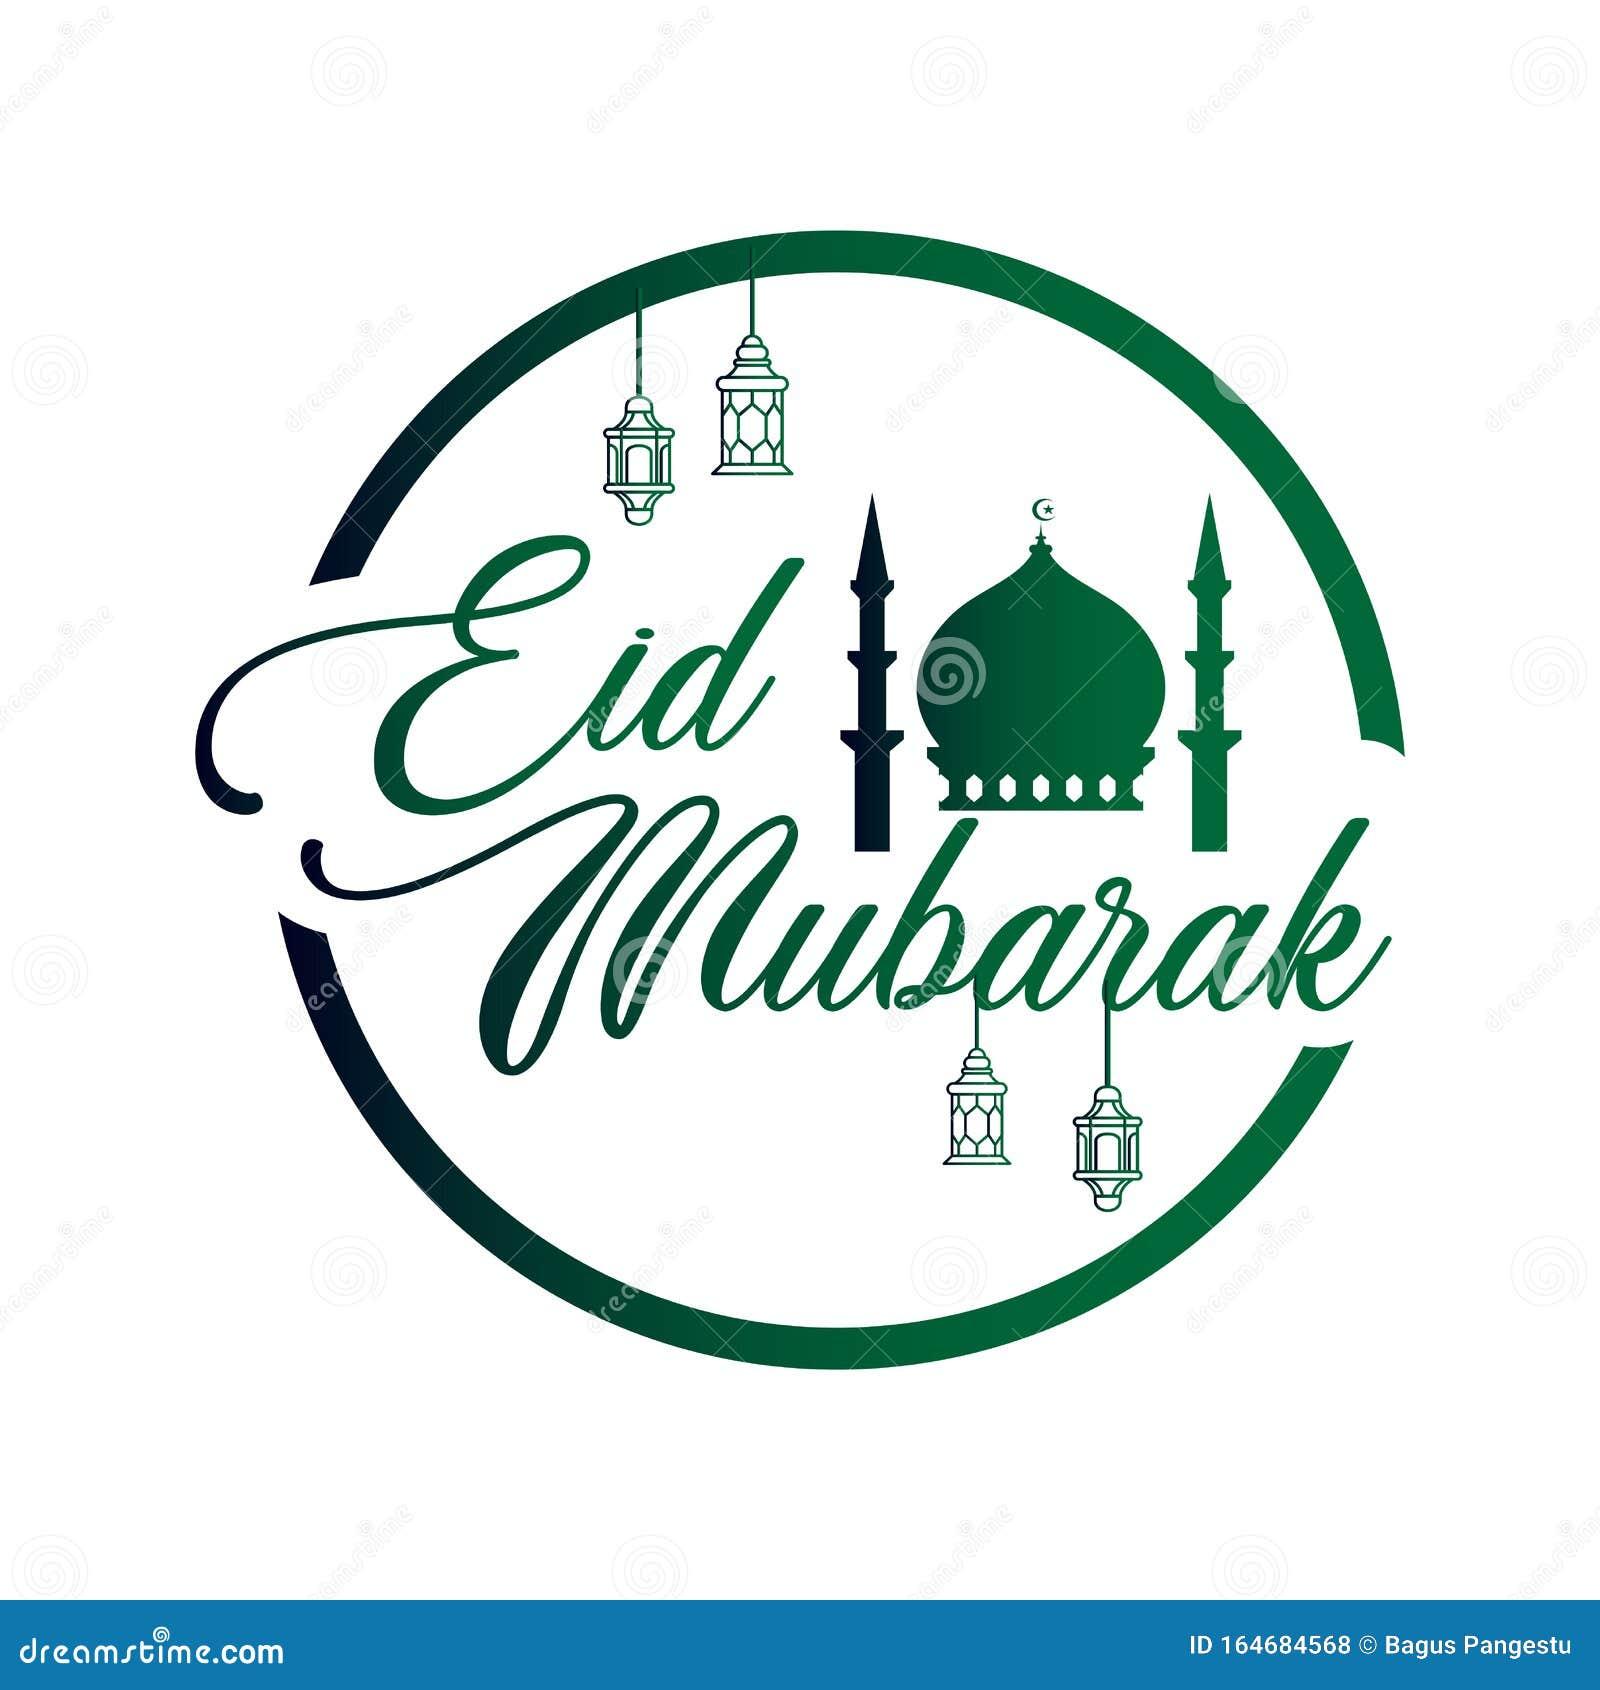 eid mubarak logo vector illustrationon white background